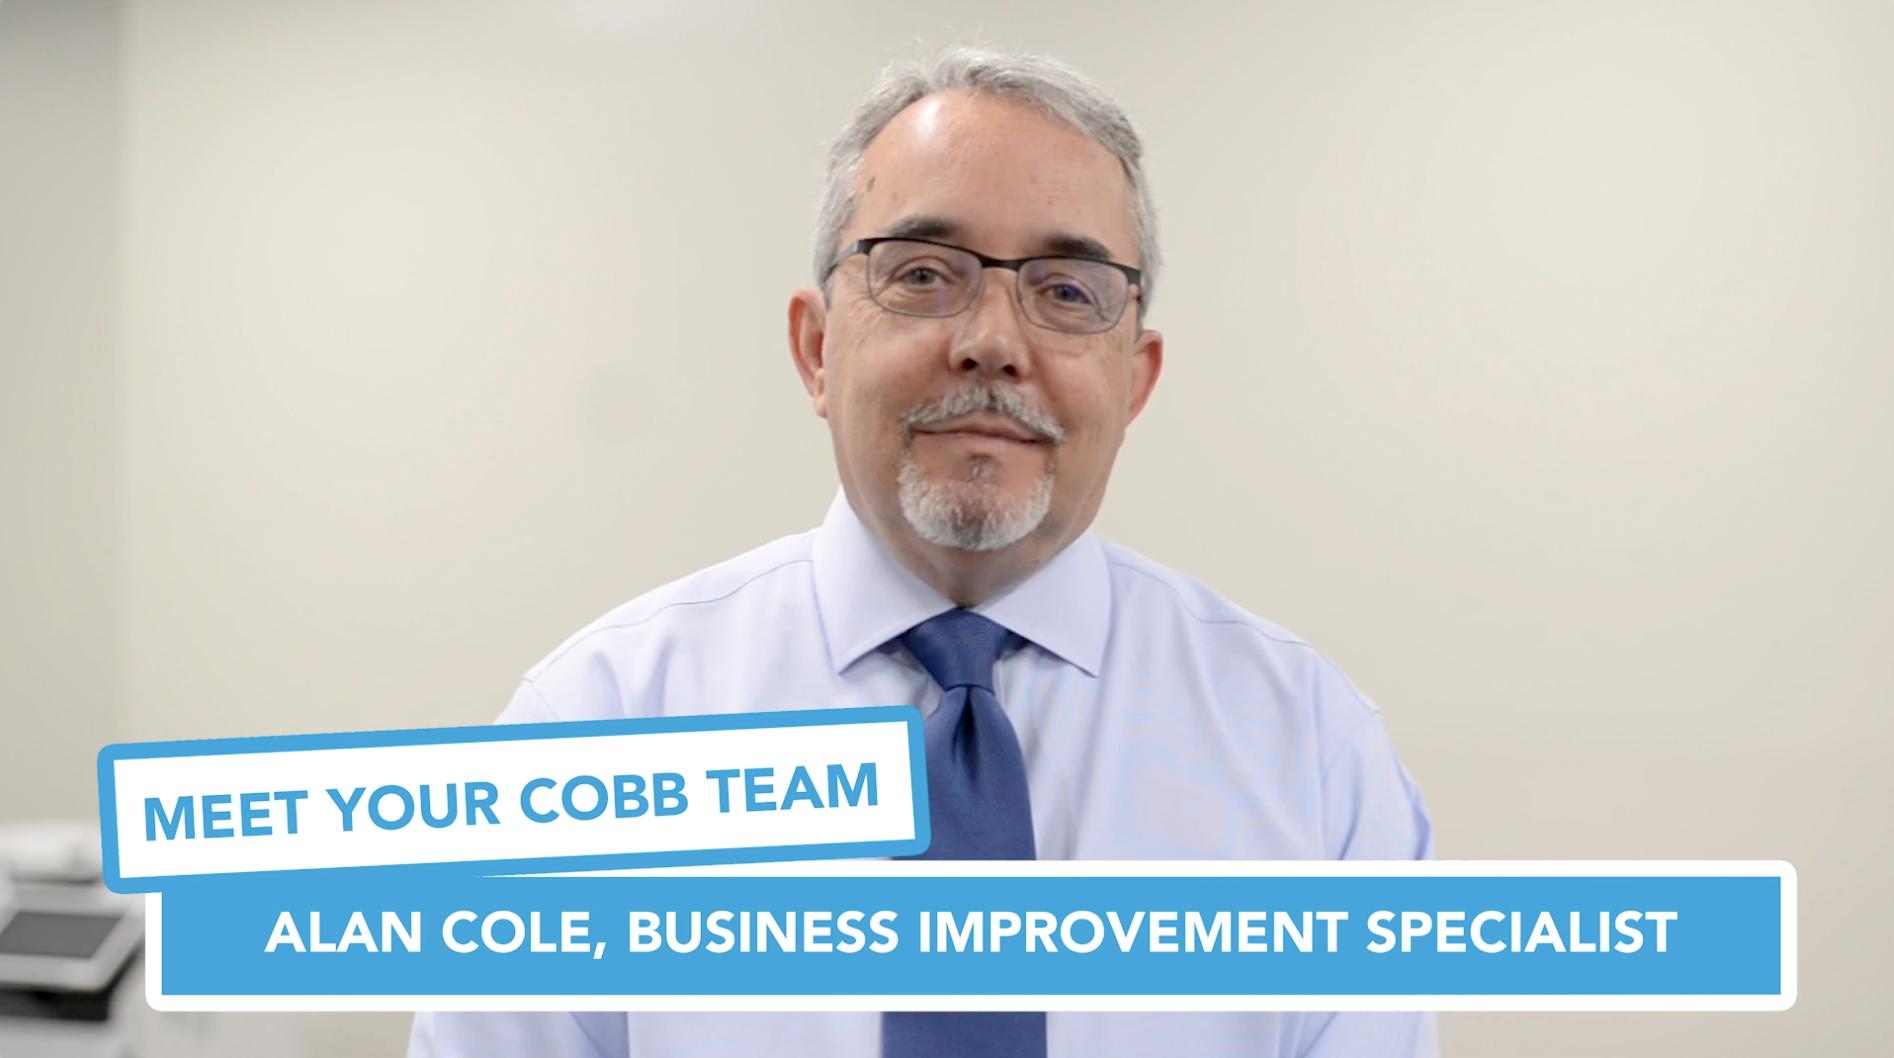 Meet Your Cobb Team: Alan Cole, Business Improvement Specialist